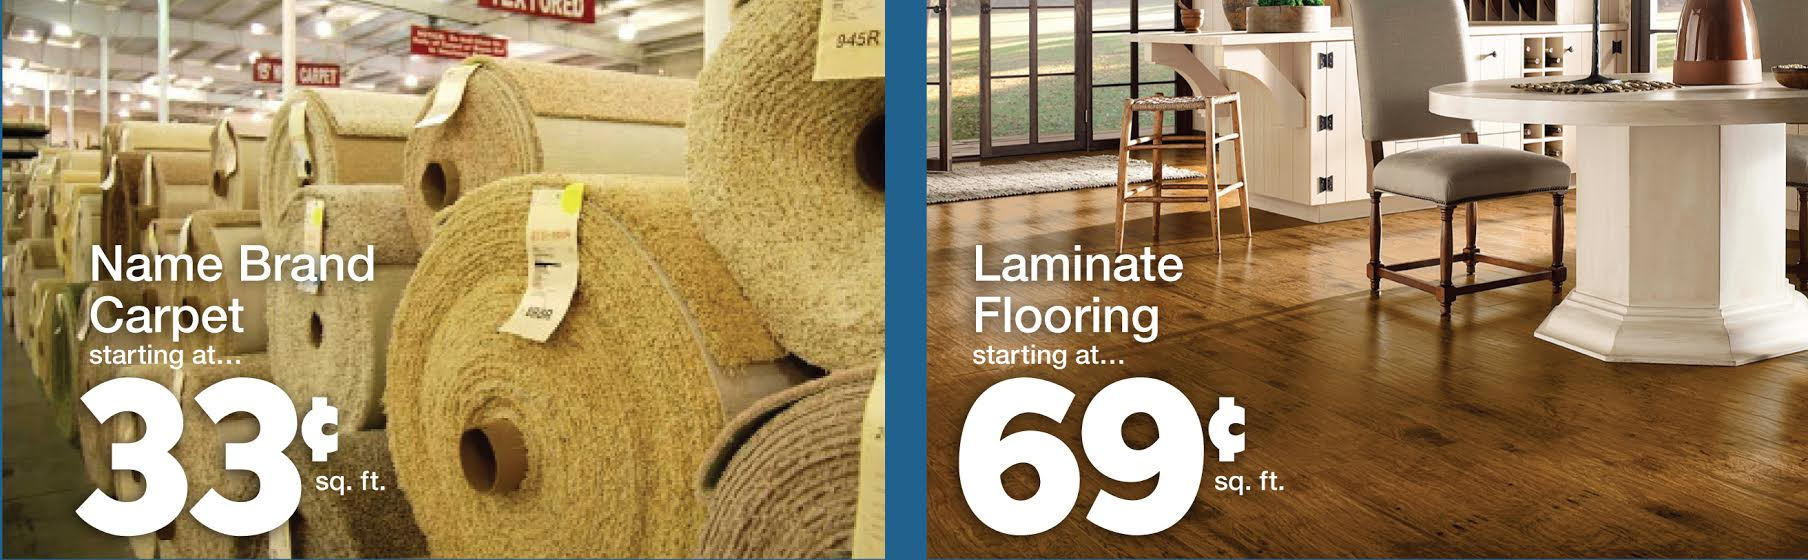 Name Brand Carpet Starting at 33 Cents per sq ft + Laminate Flooring Starting at 69 Cents per sq ft